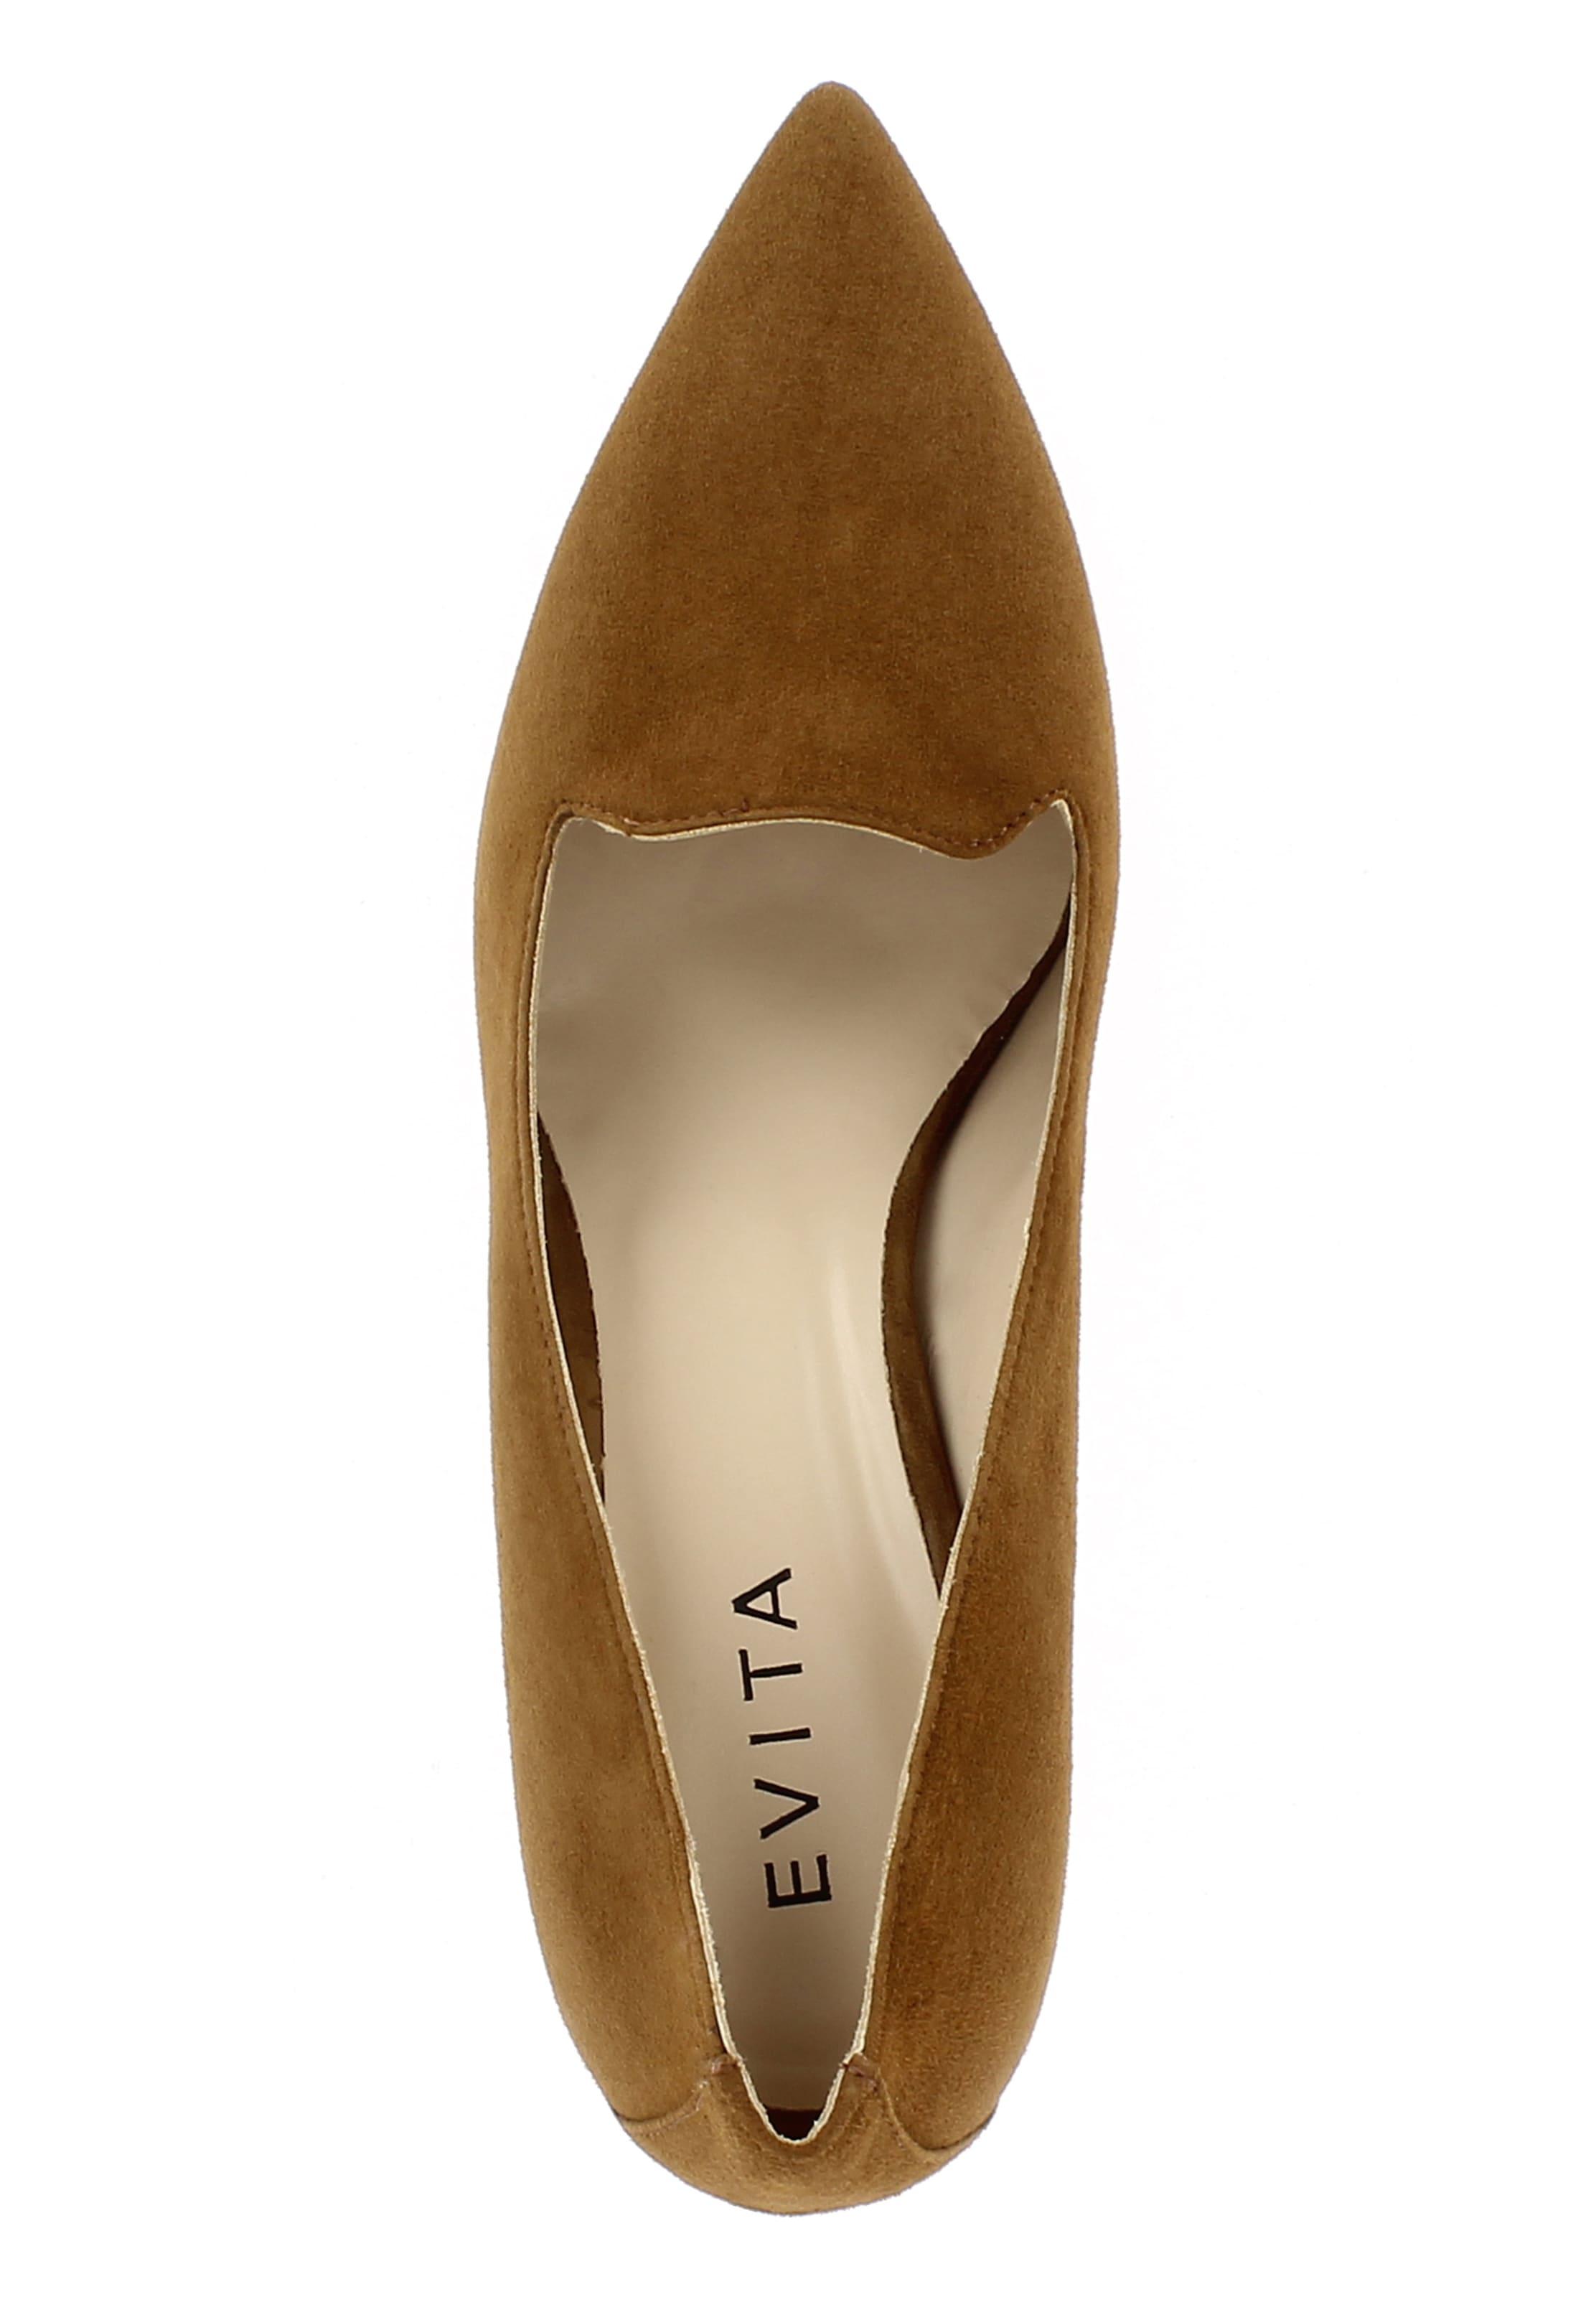 EVITA Pumps 'ROMINA Leder Bequem, gut aussehend aussehend aussehend 474c2b